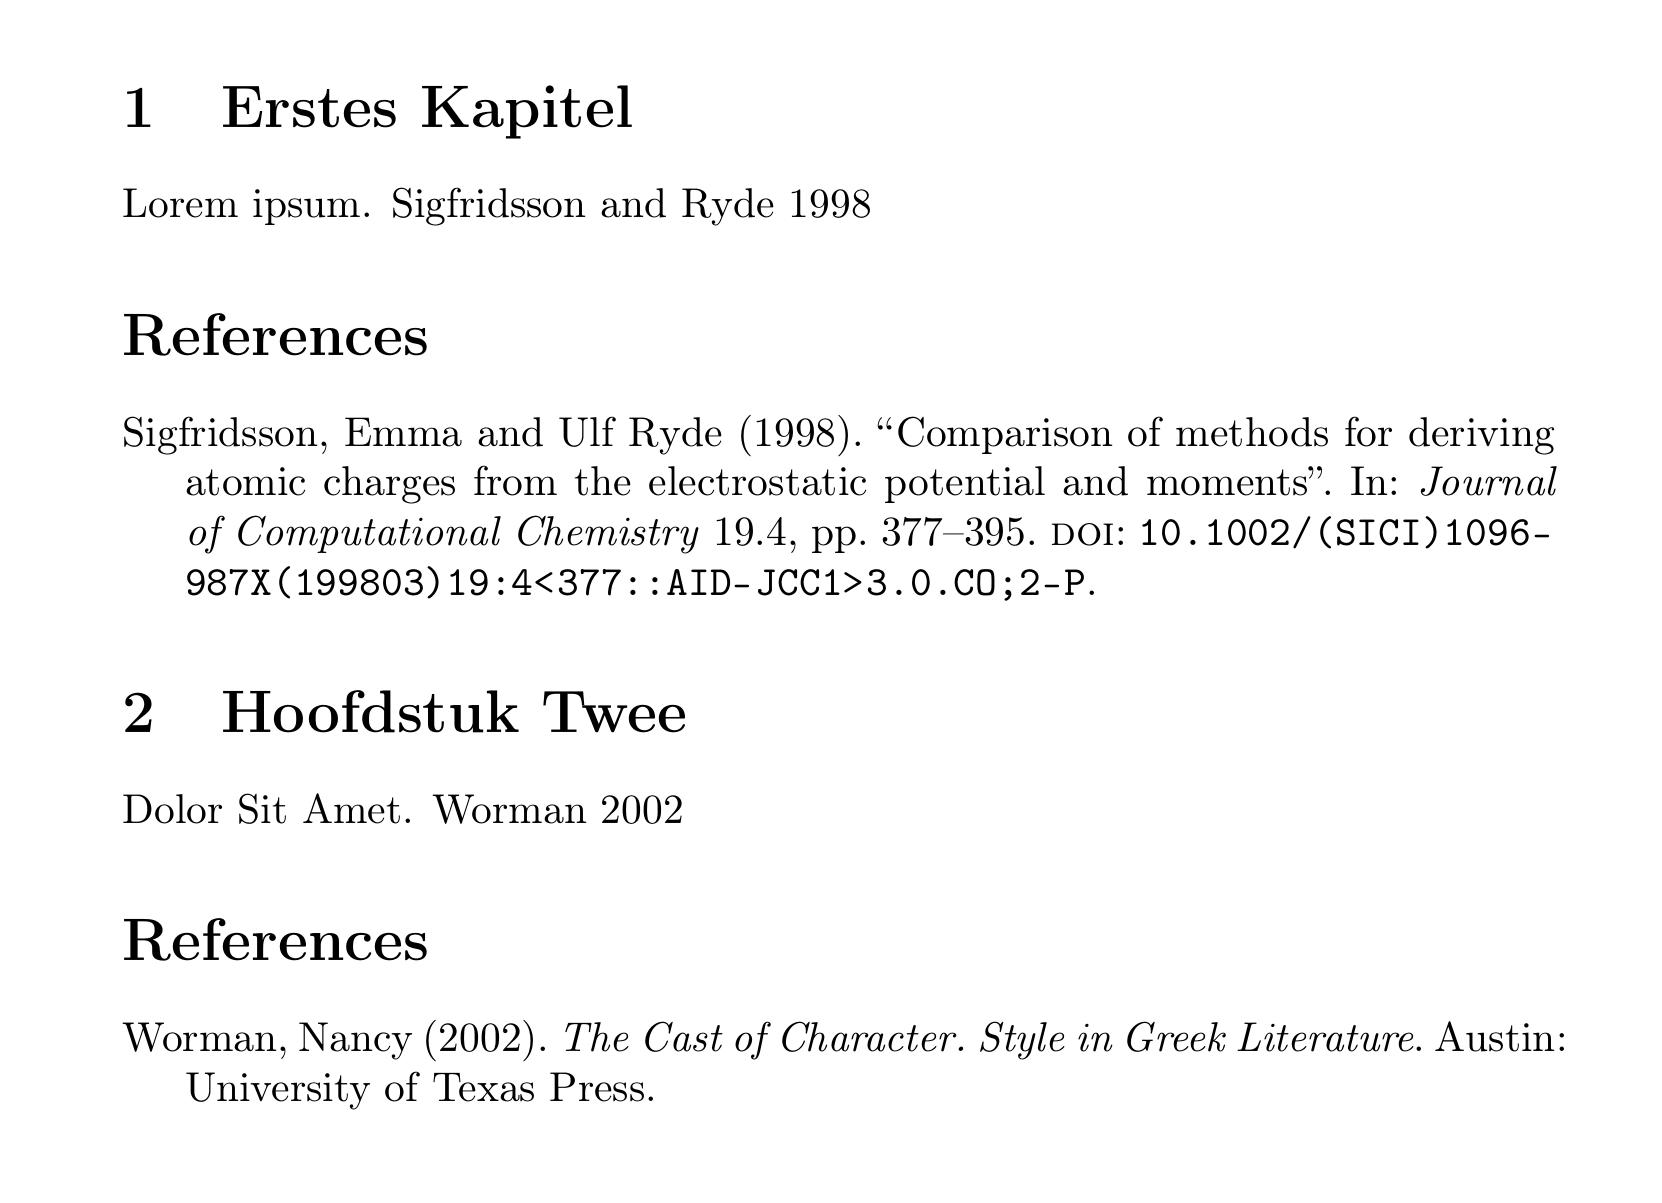 Essay writer helper graduate theological foundation missing template file for using figures in latex johnkerl org sharelatex buycottarizona